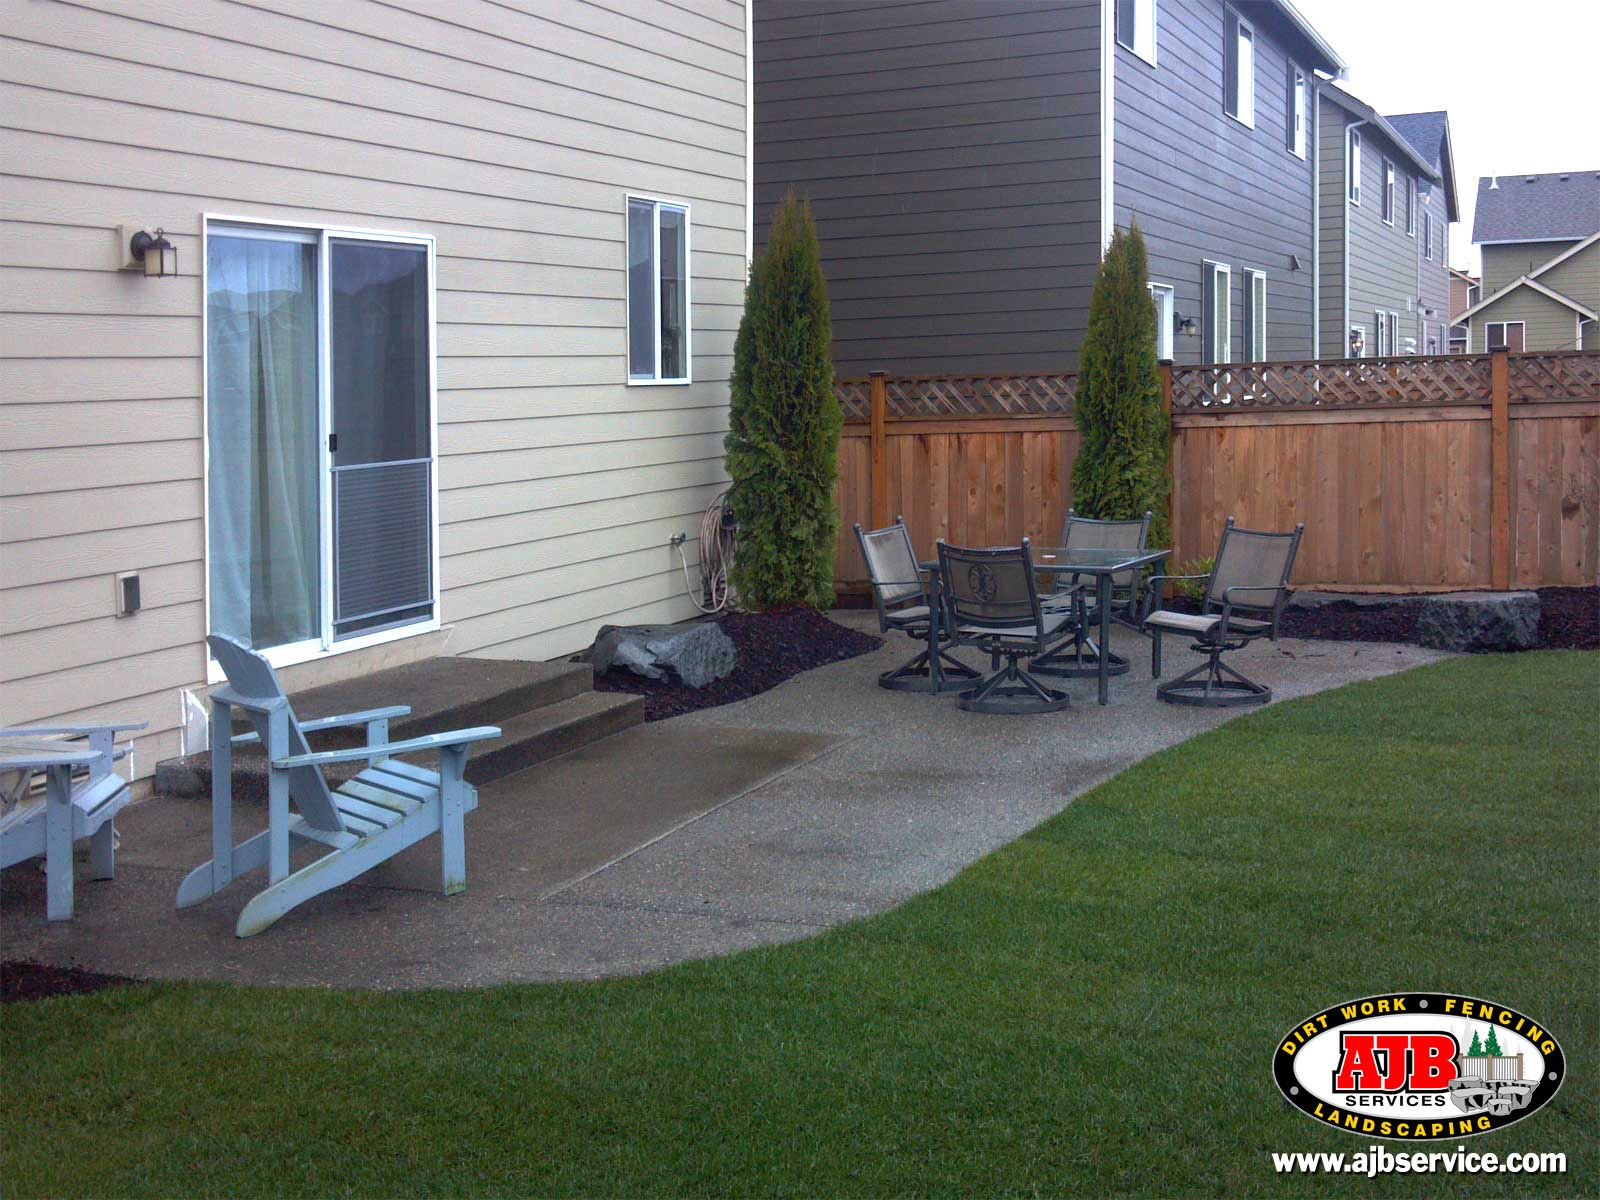 Exposed aggregate concrete patio extension. http//shortn